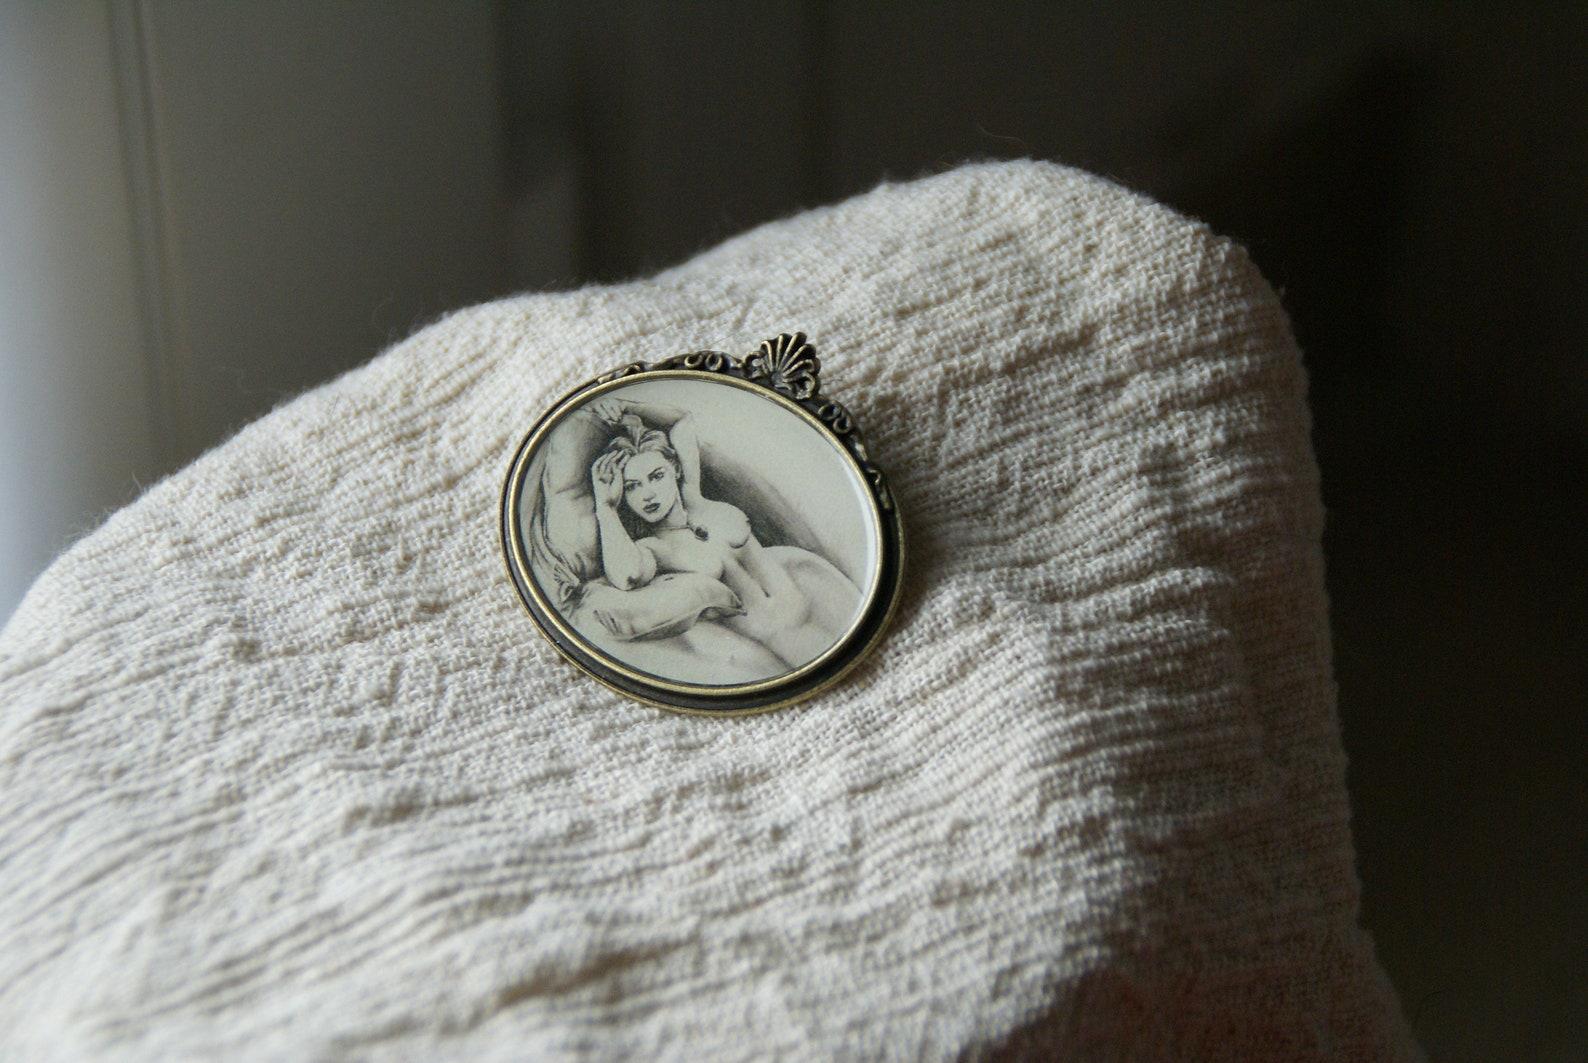 Kate Winslet: Nude Titanic painting still haunts me